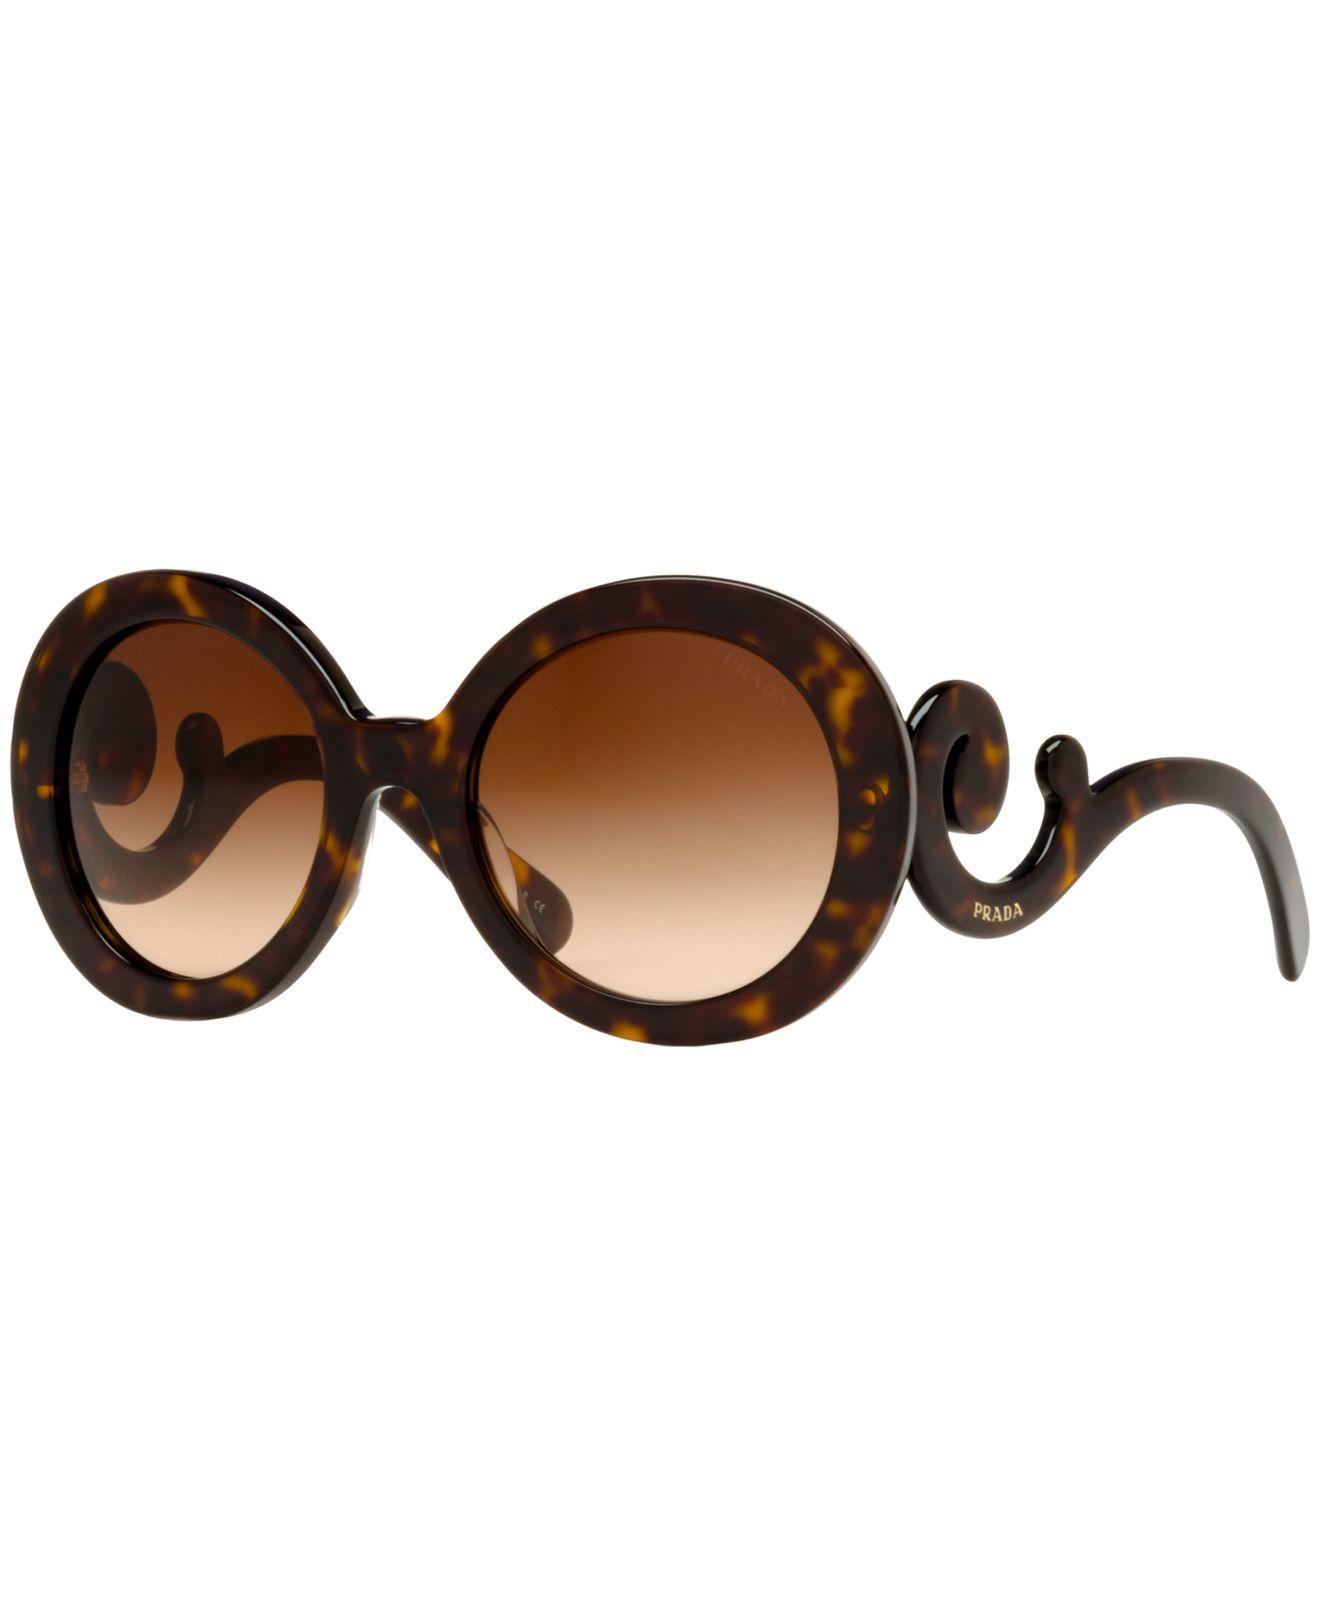 71d5c4f2c6f Prada Sunglasses Sale